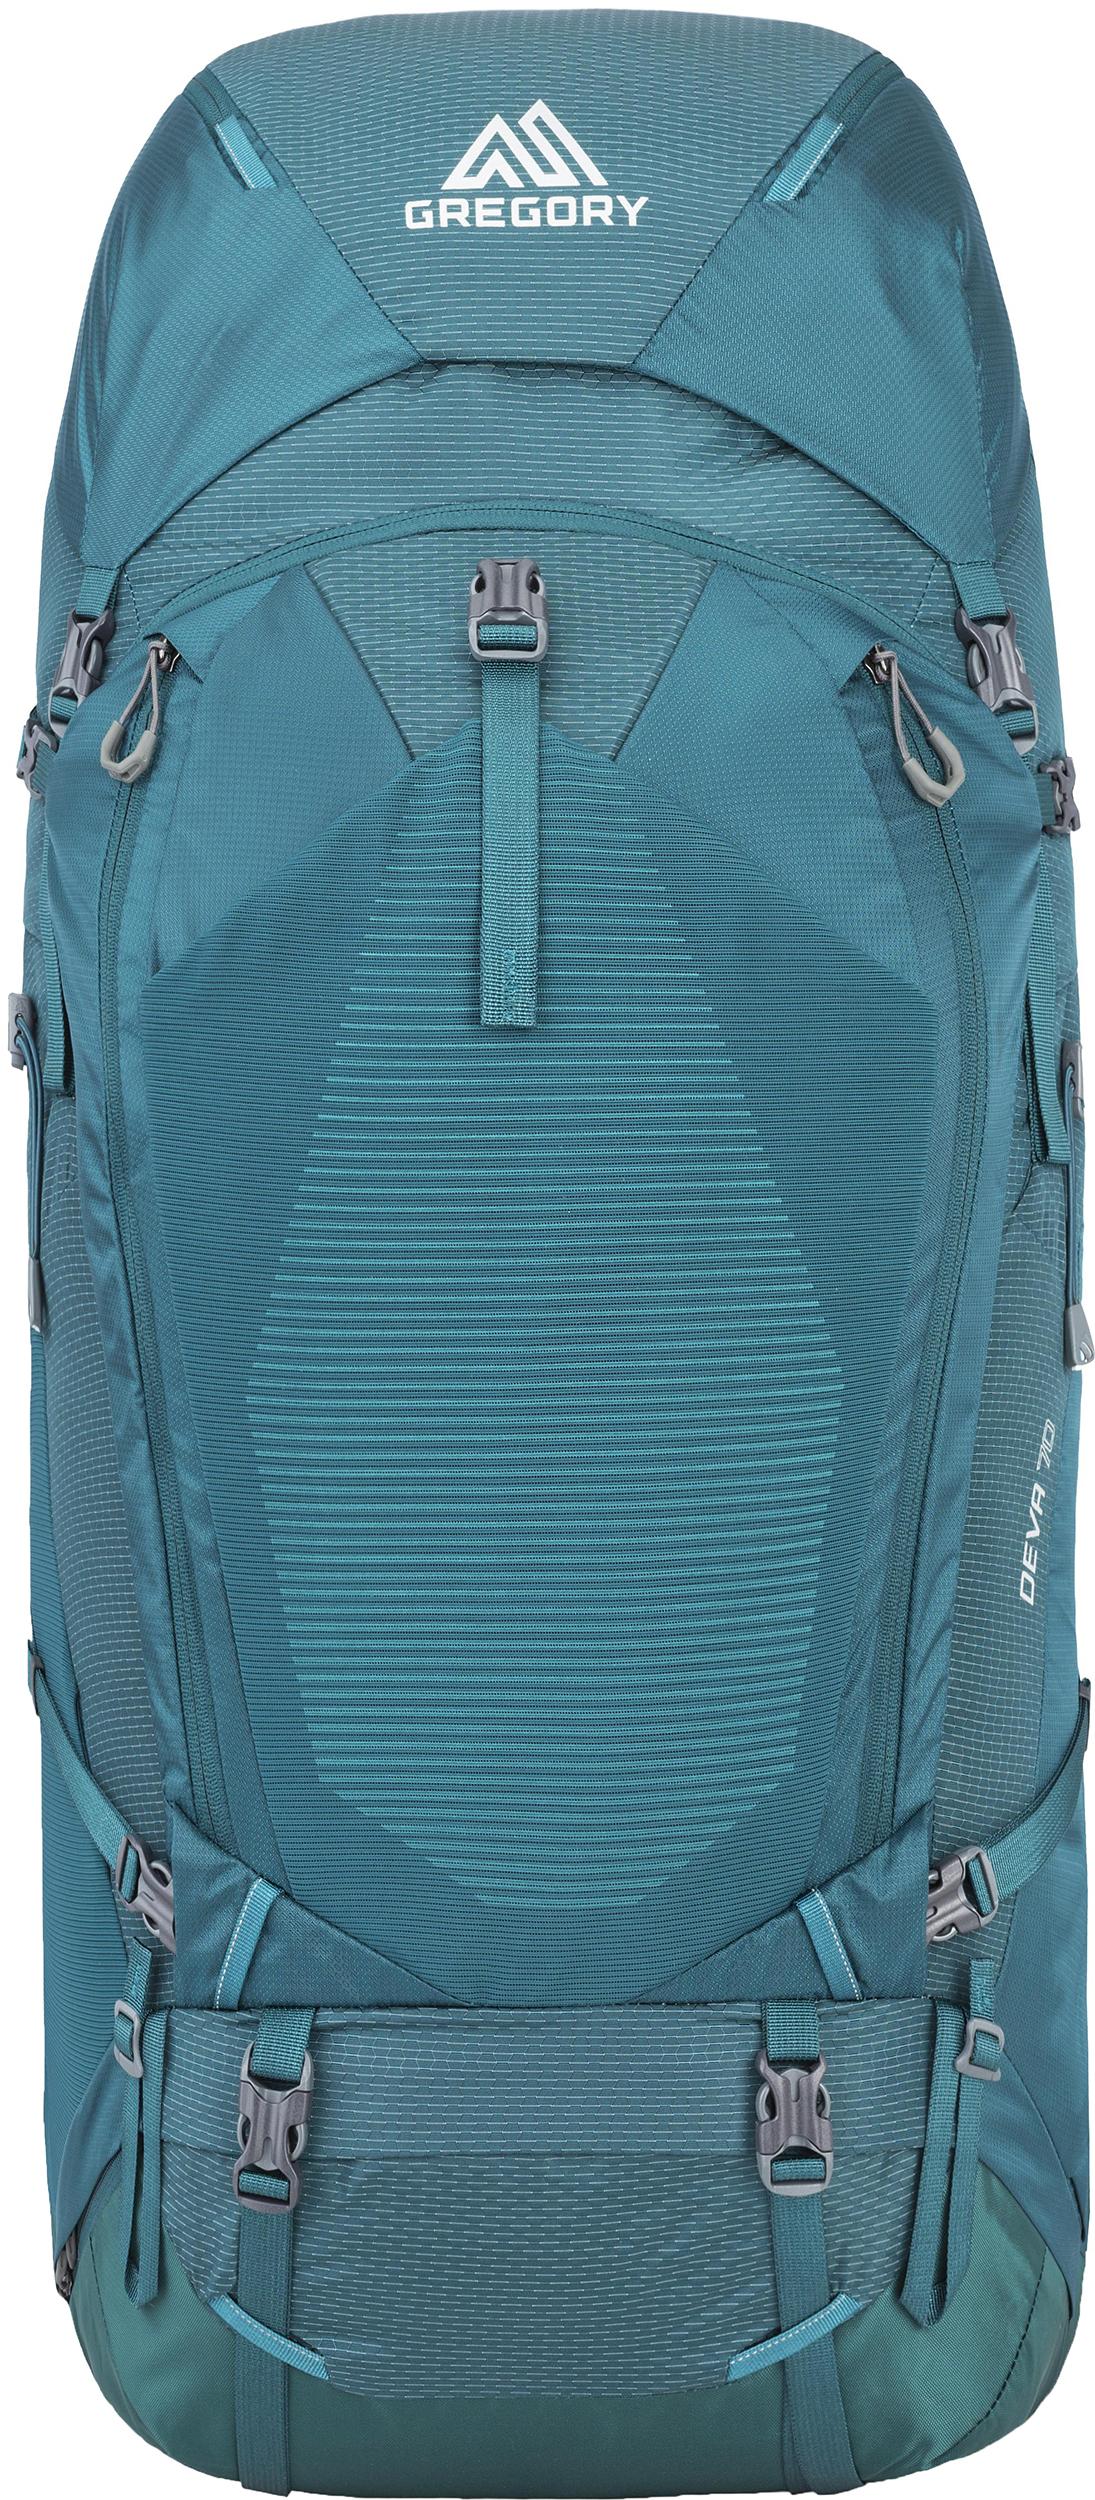 2737d24ad1 Gregory Deva 70 Backpack - Women s